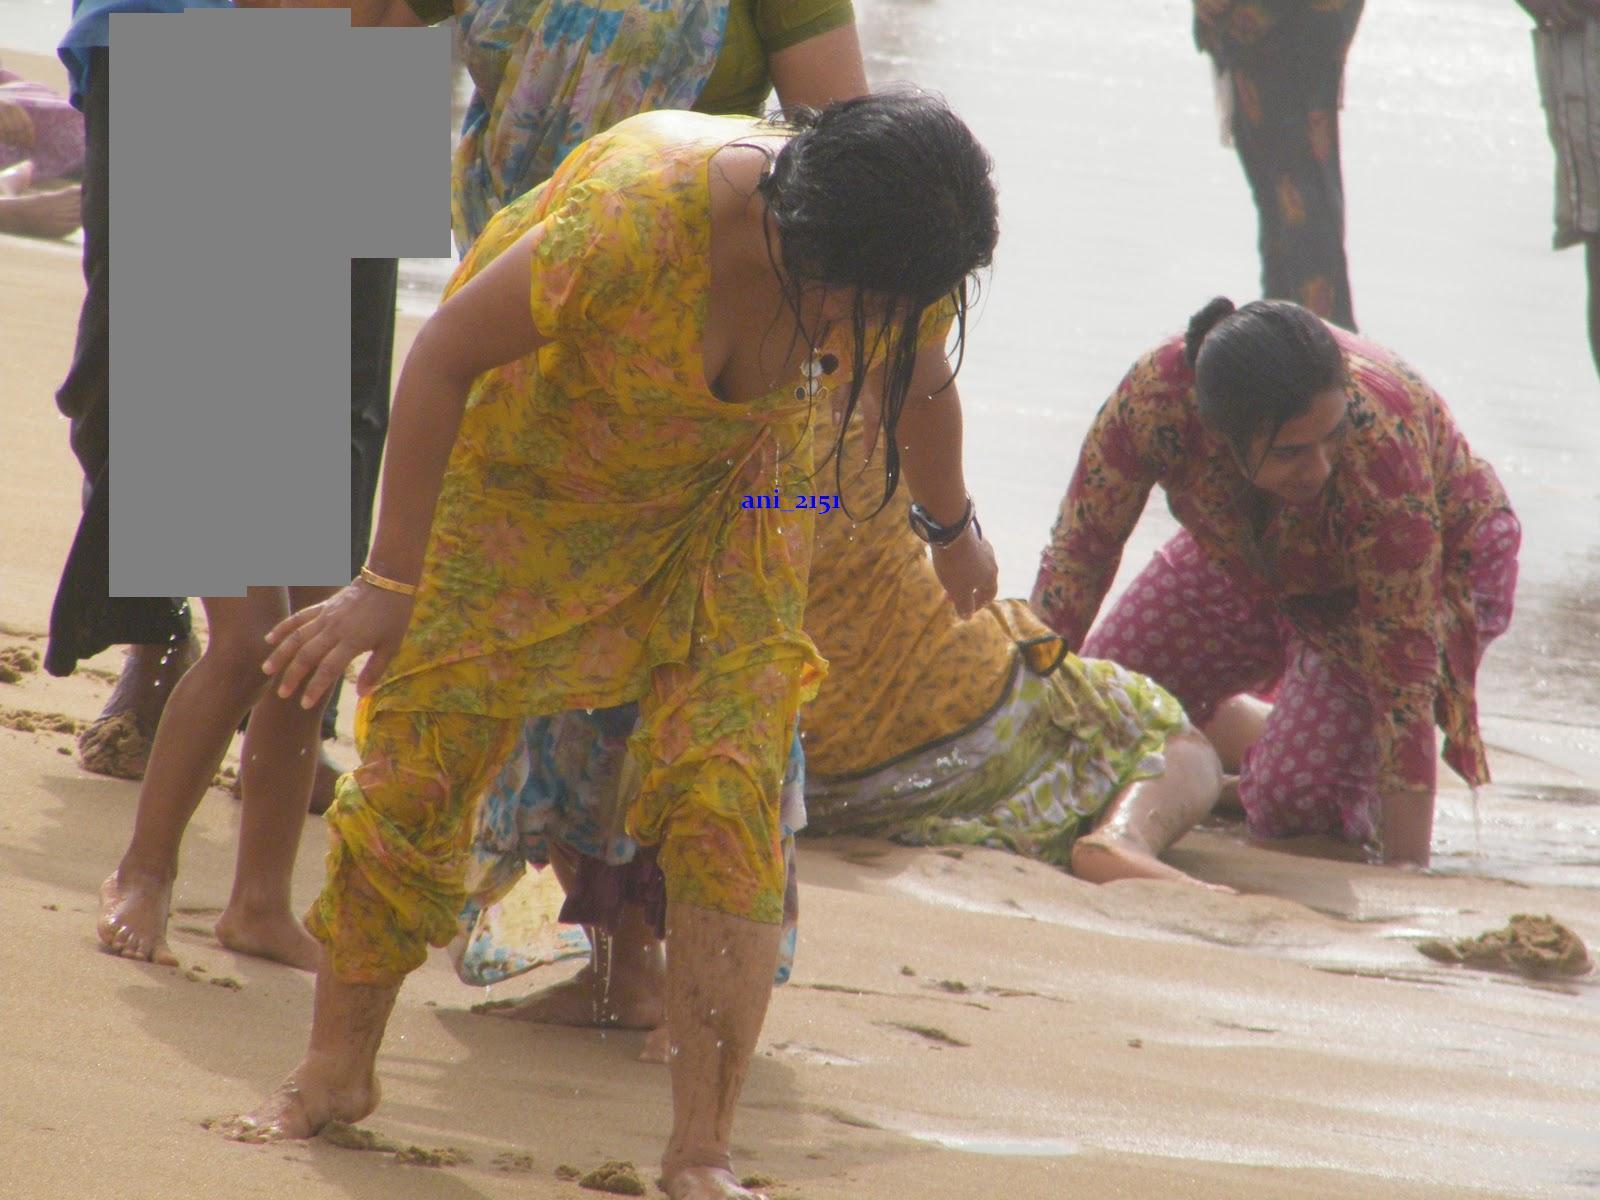 Ganga river bathing women naked